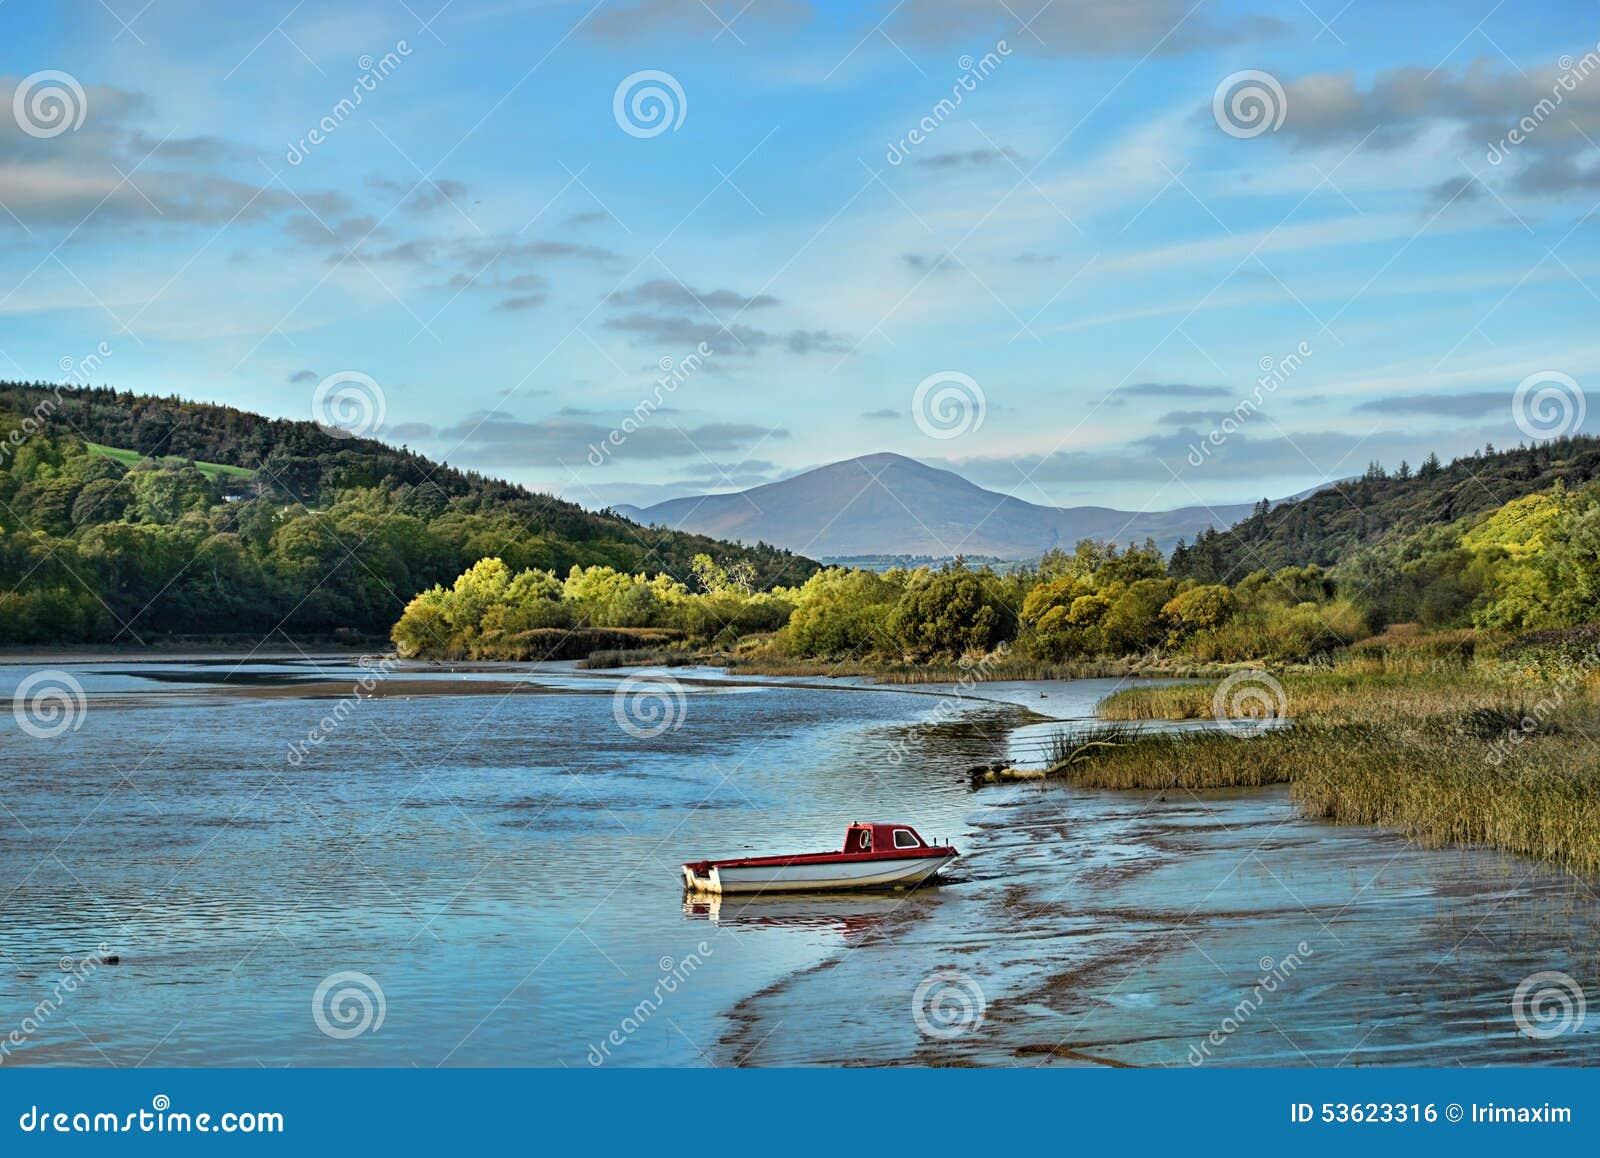 Blackwater river in Ireland